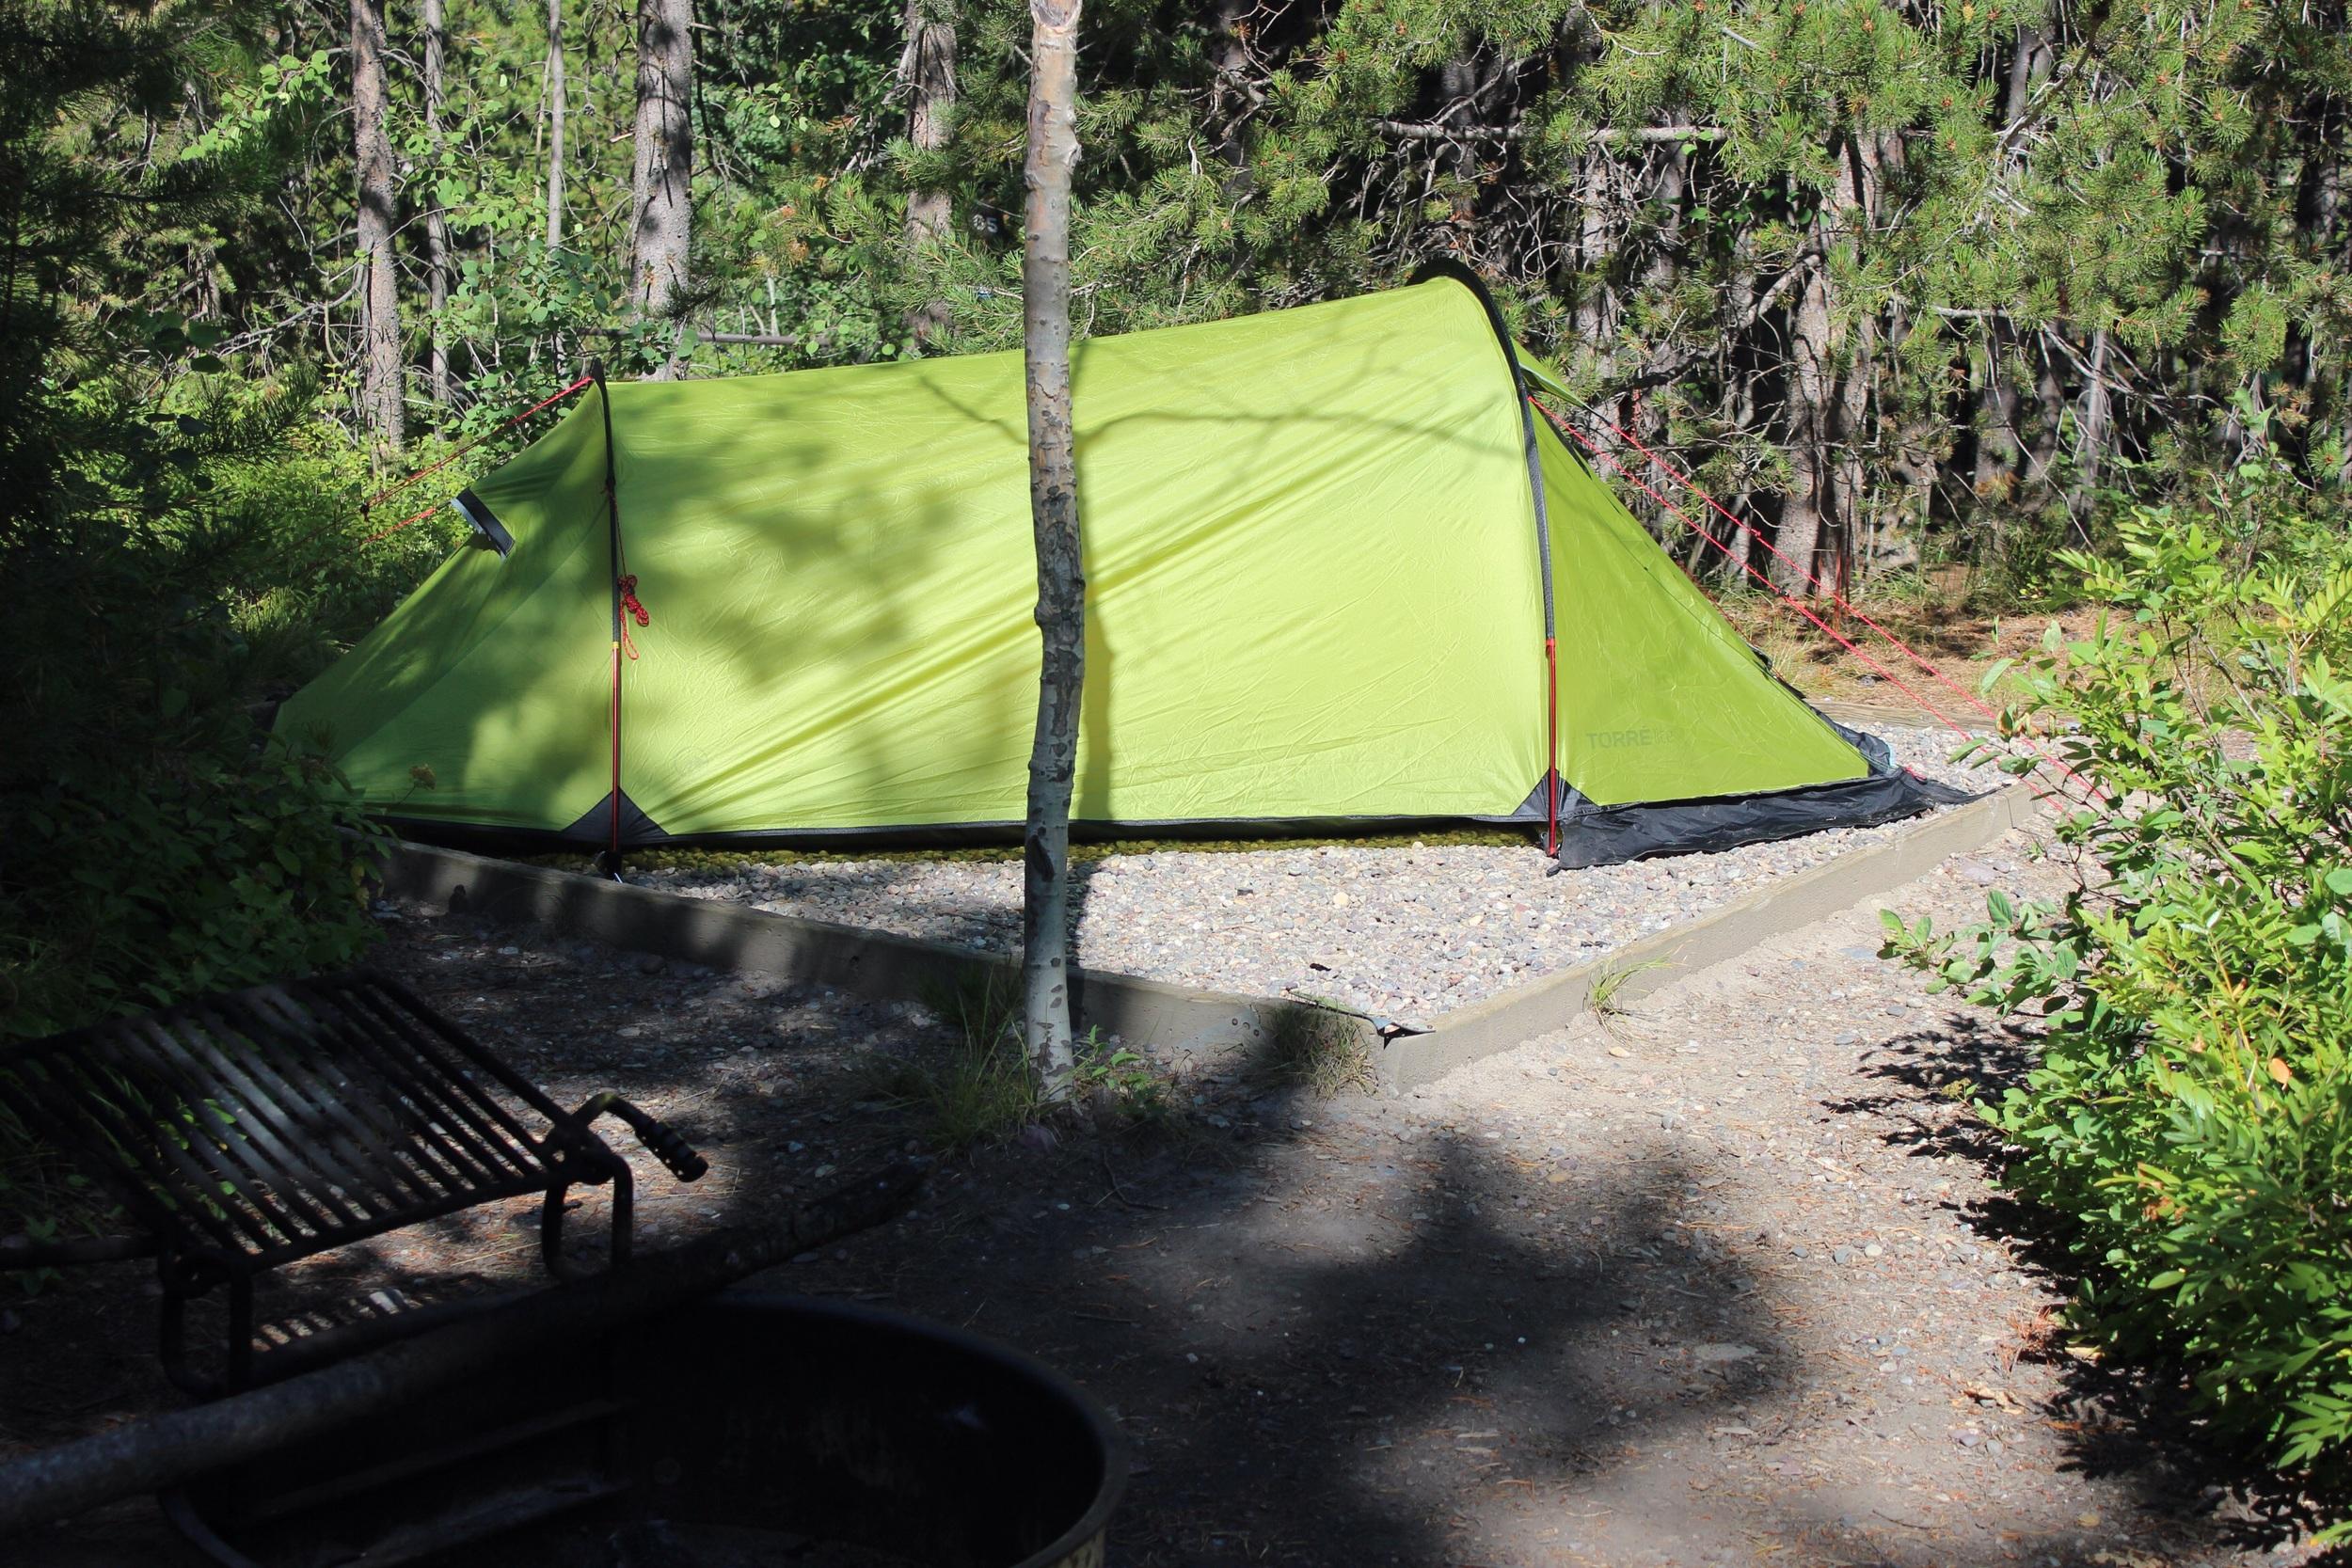 Camp set up, Grand Teton national park, Wyoming